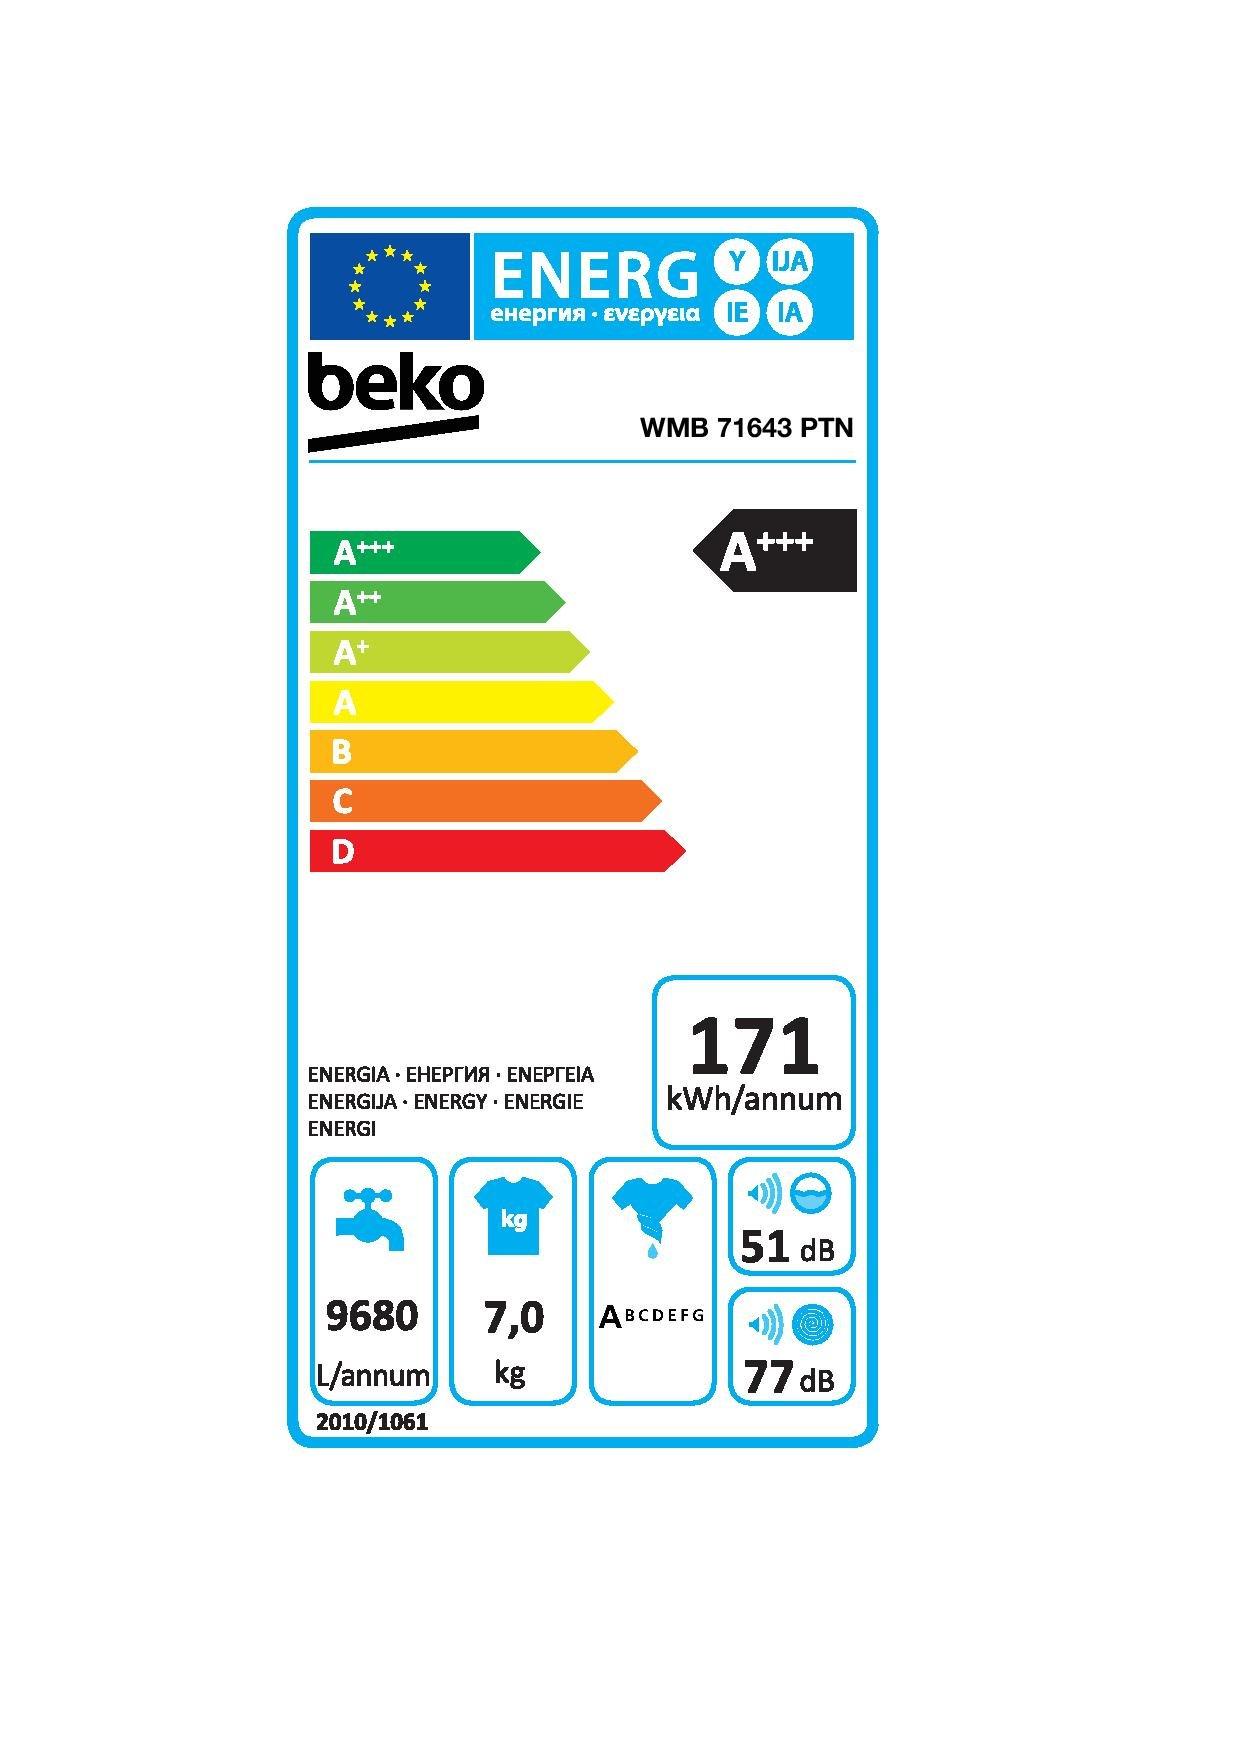 Beko-WMB-71643-PTN-Waschmaschine-Frontlader-A-1600pM-7kg-wei-Super-Express-14-Mengenautomatik-Watersafe-ProSmart-Inverter-Motor-Pet-Hair-Removal